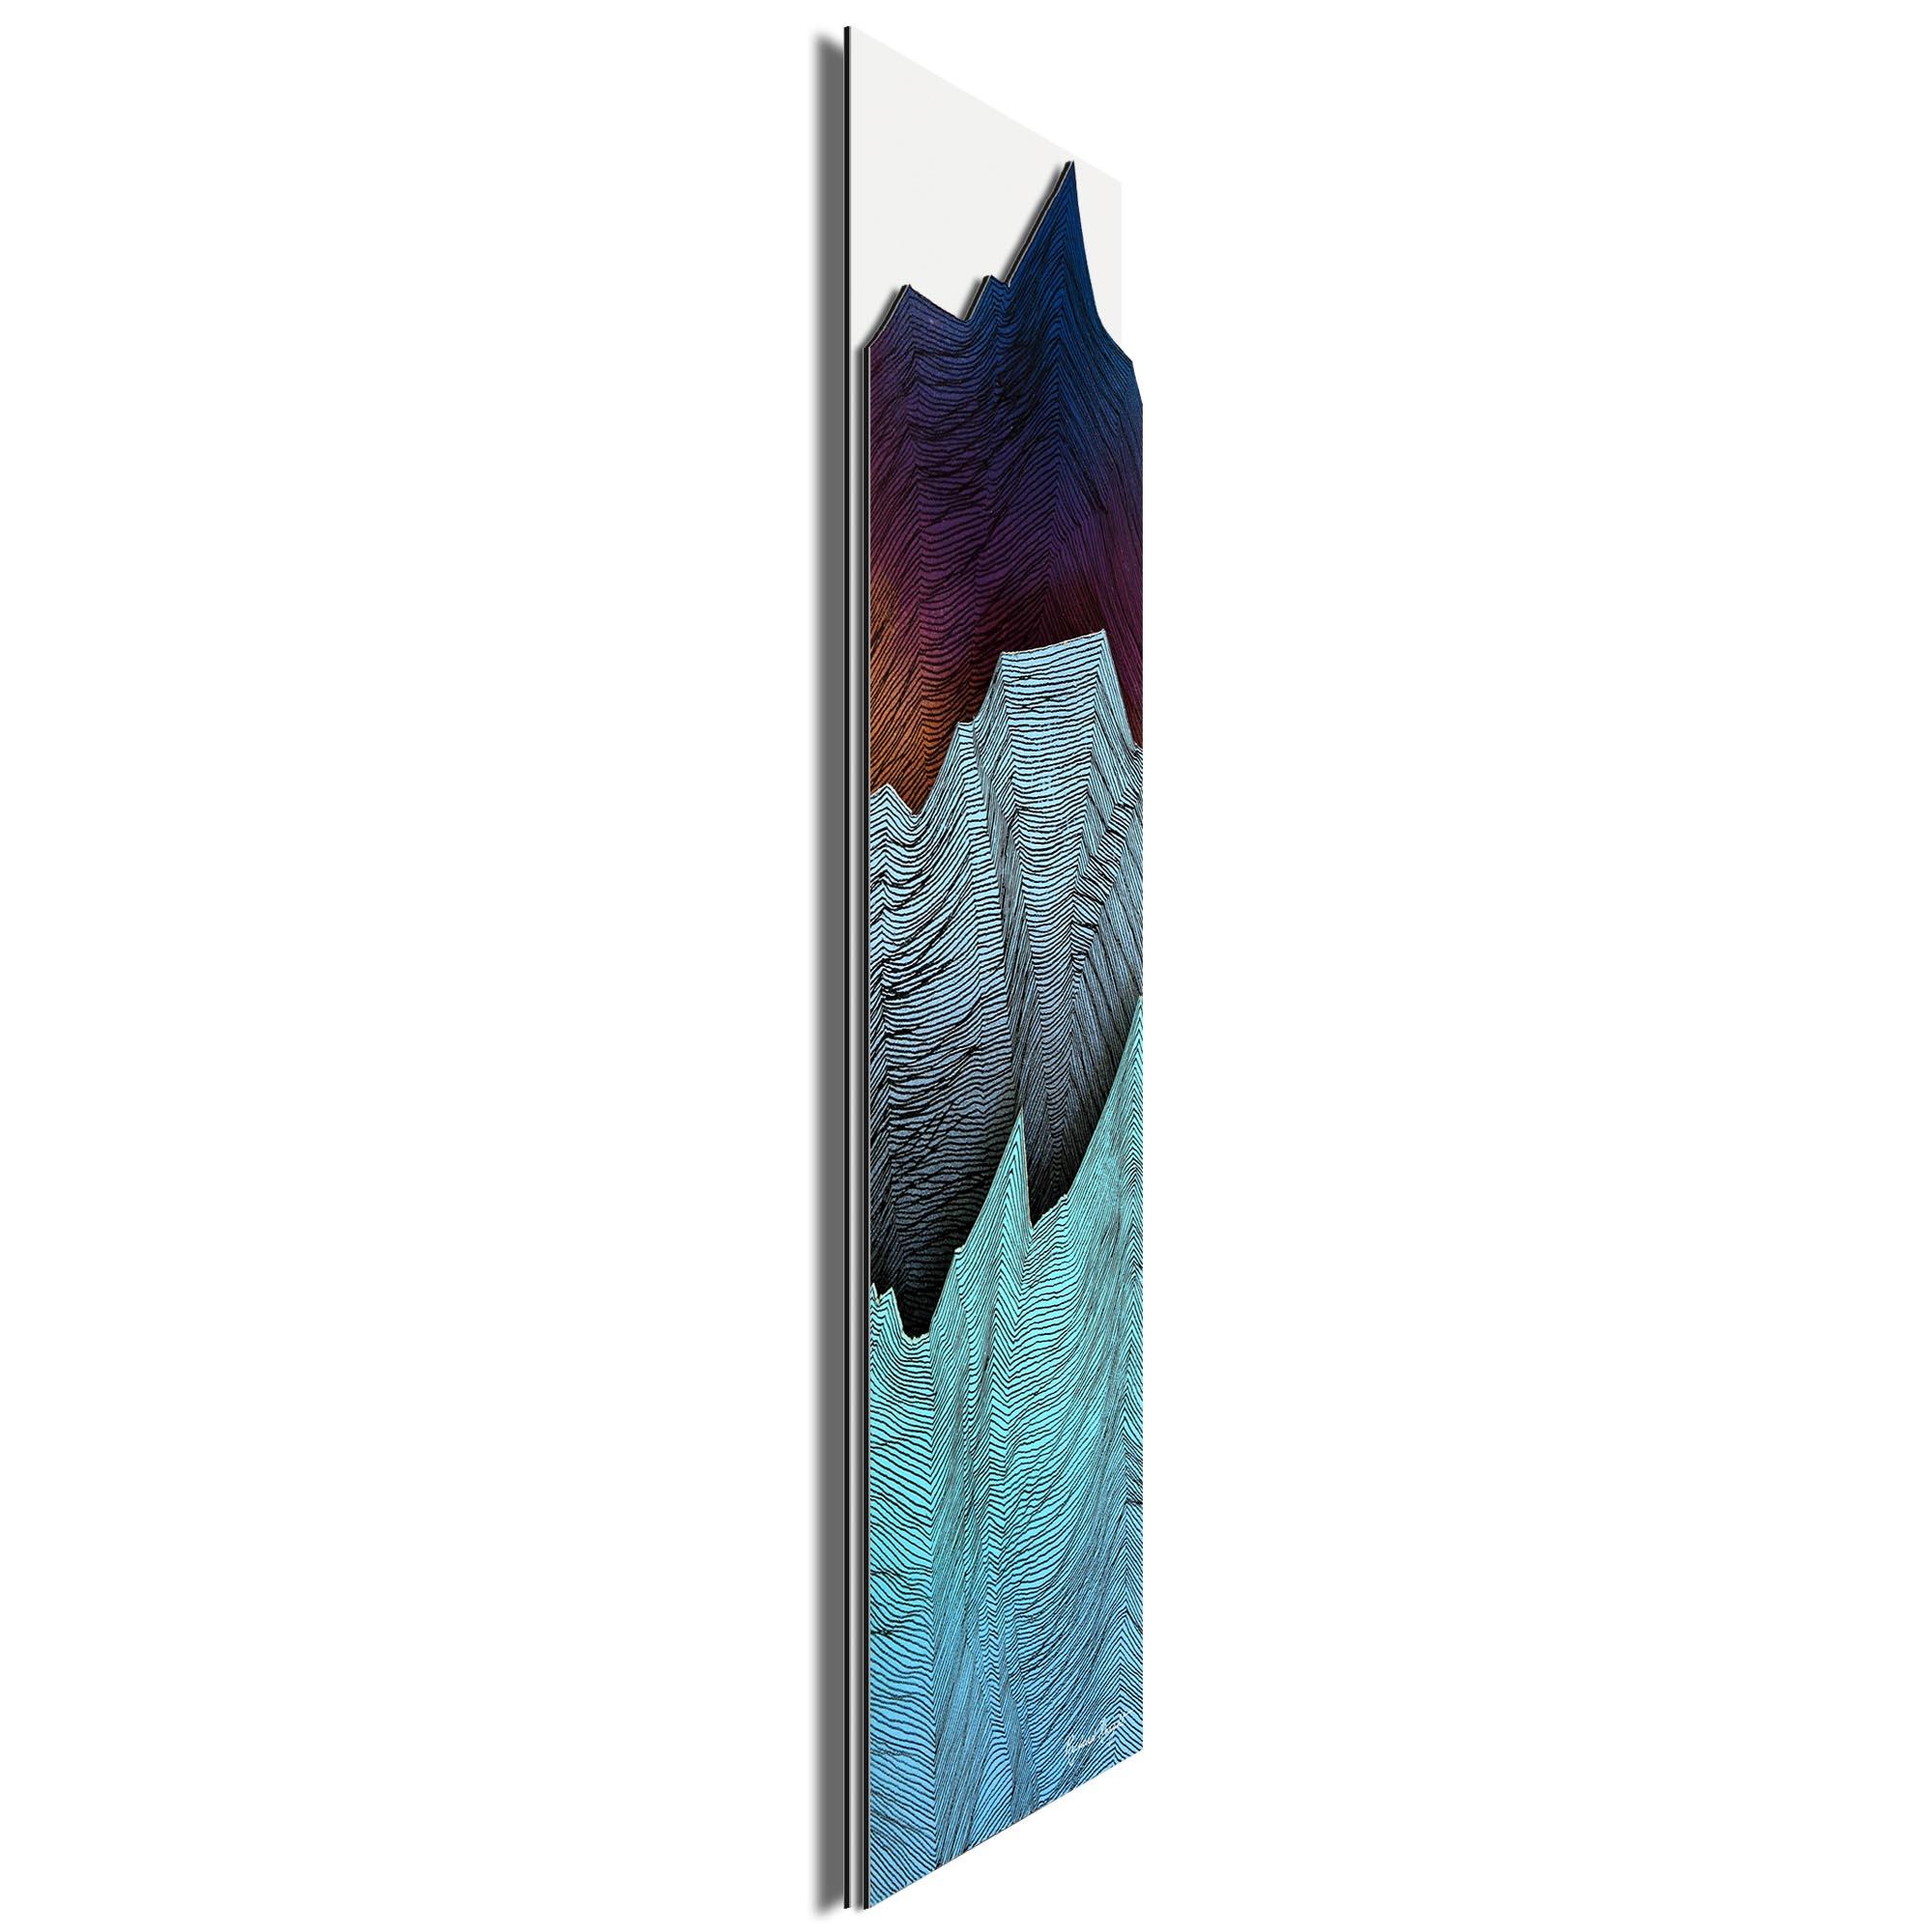 Cool Peaks by Richard Knight - Ltd. Ed. Minimalist Abstract Landscape Art - Image 2